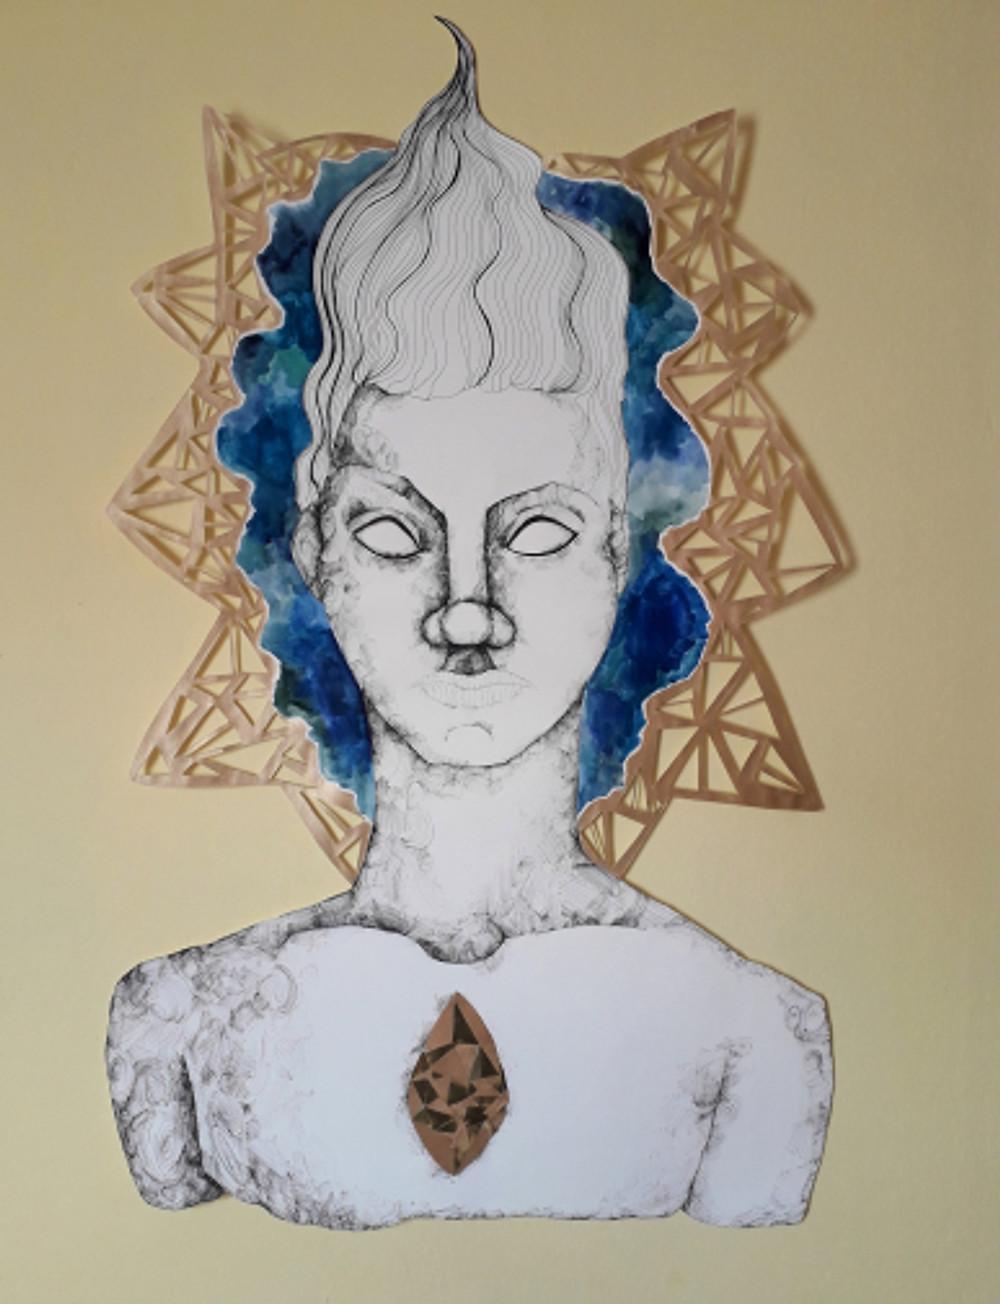 a stance of defiance,100x67 cm, paper cut figure, inking pen, watercolor, 2018